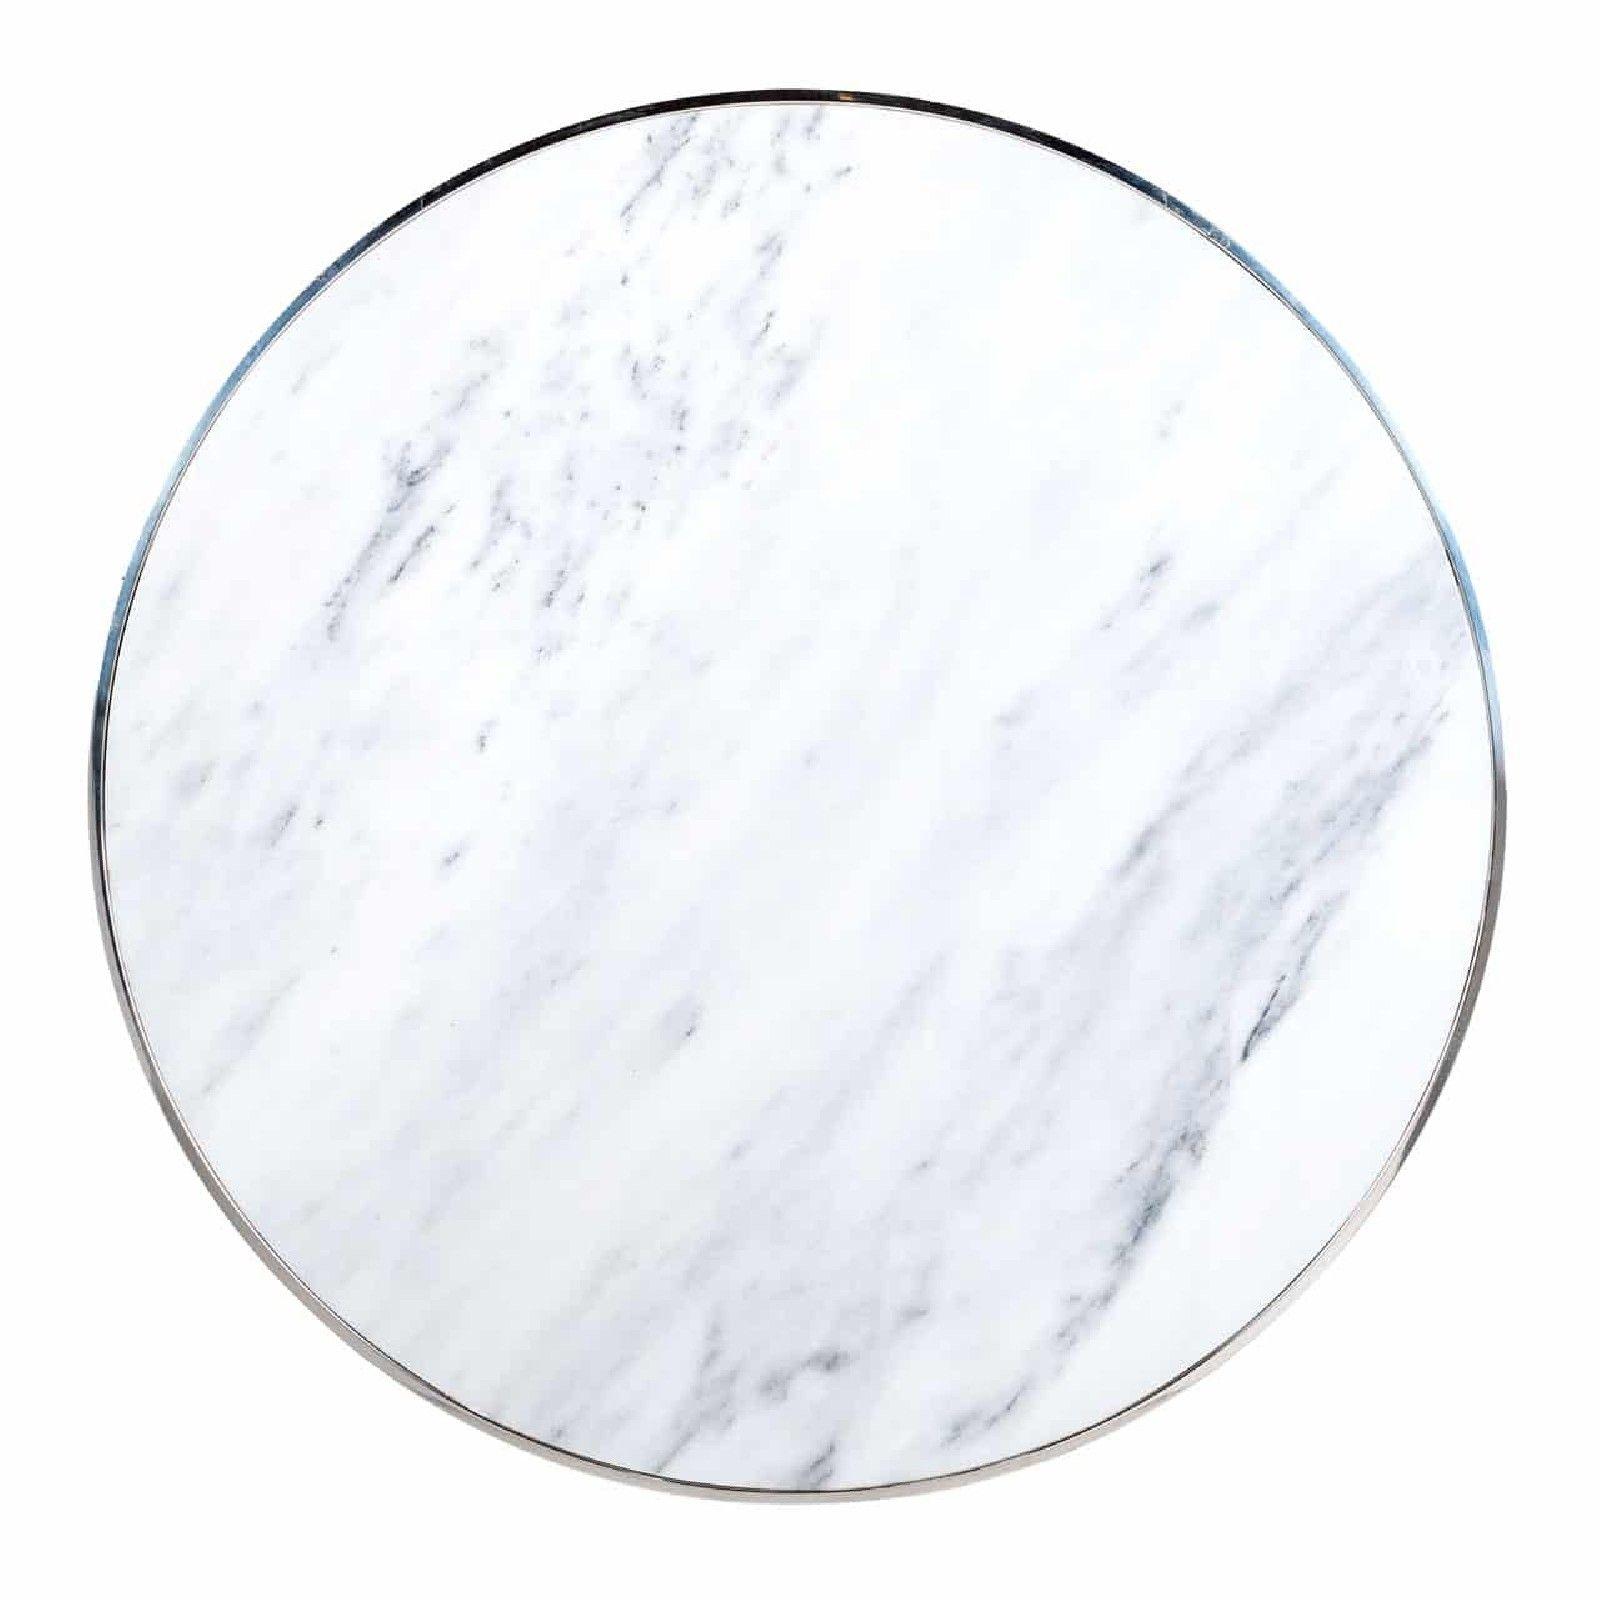 Table basse ronde 95Ø -  Inox et marbre blanc